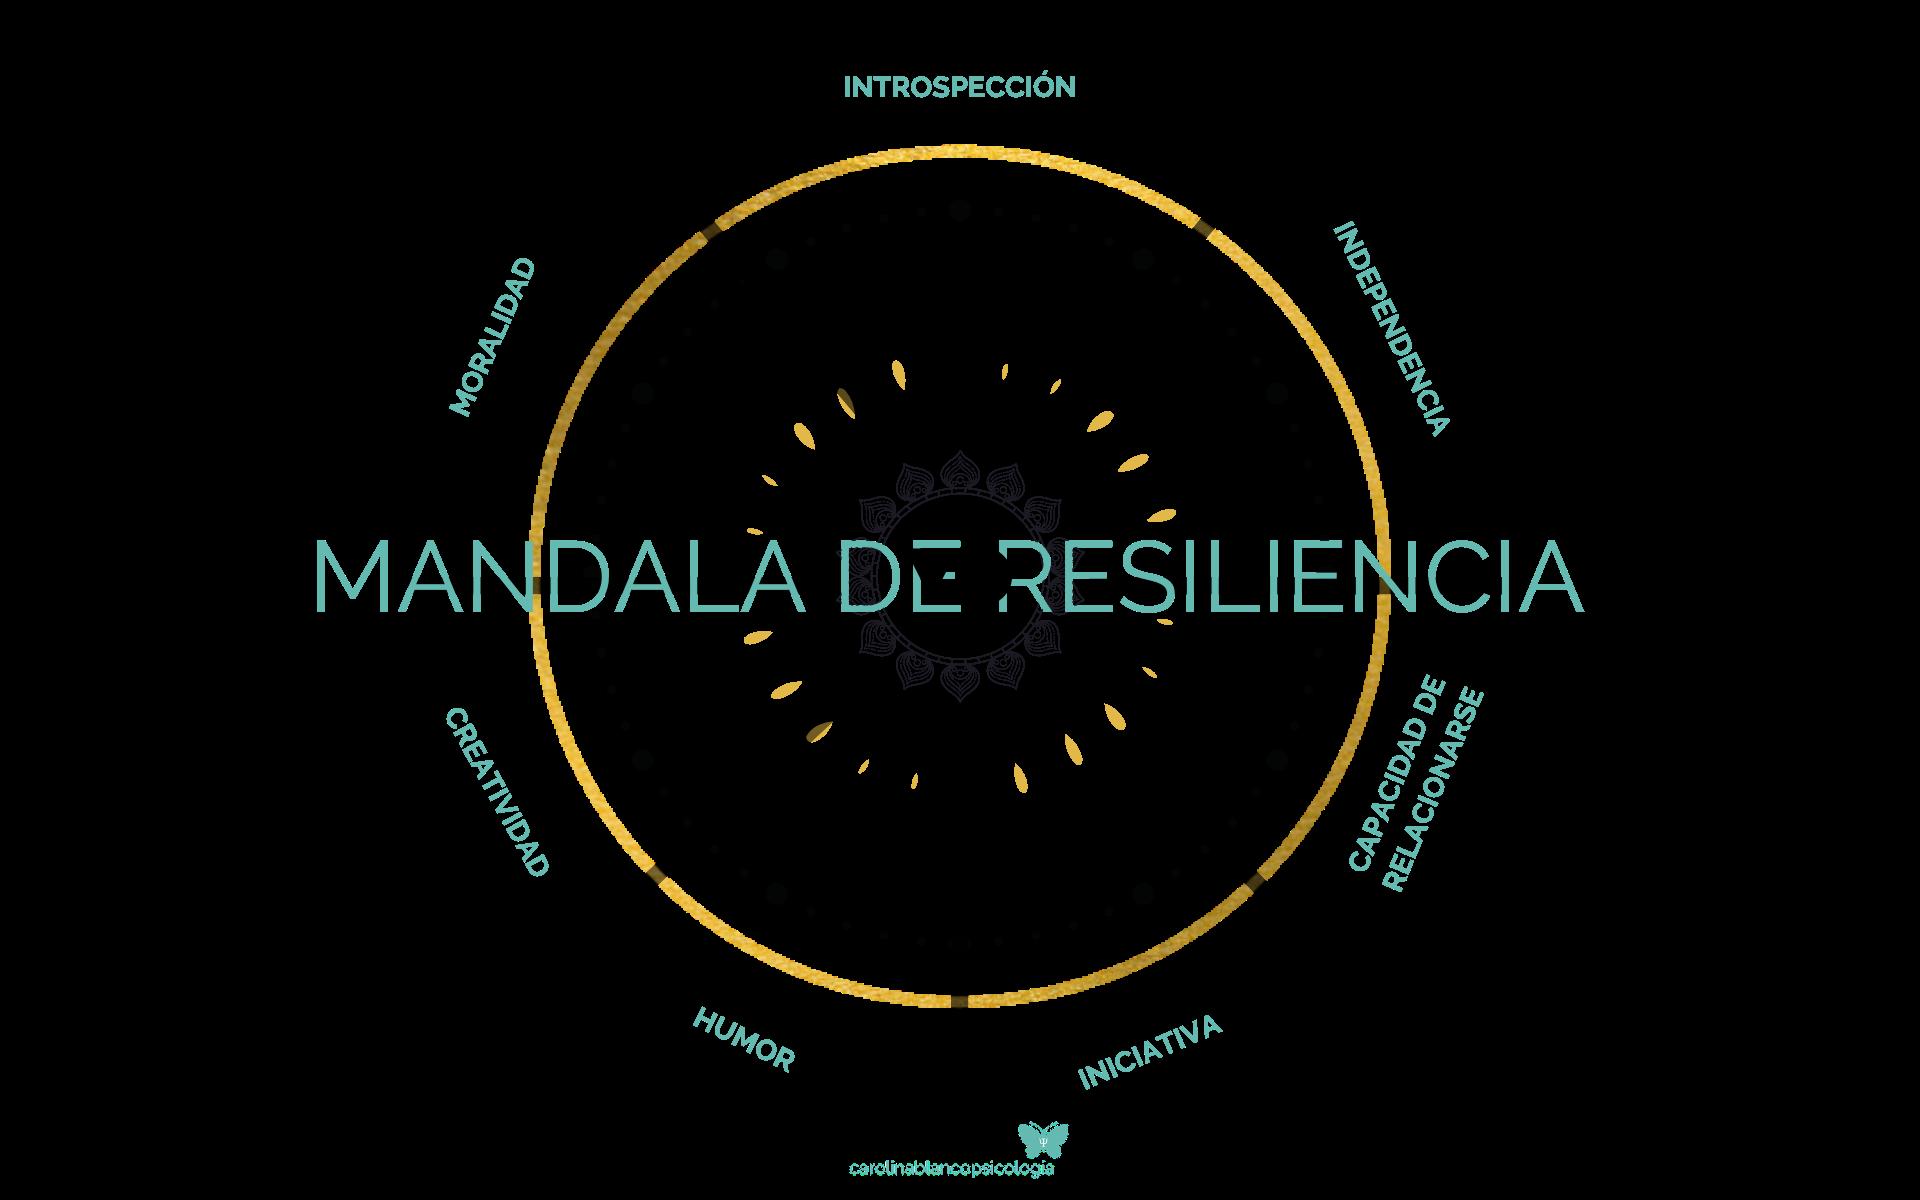 Mandala de Resiliencia